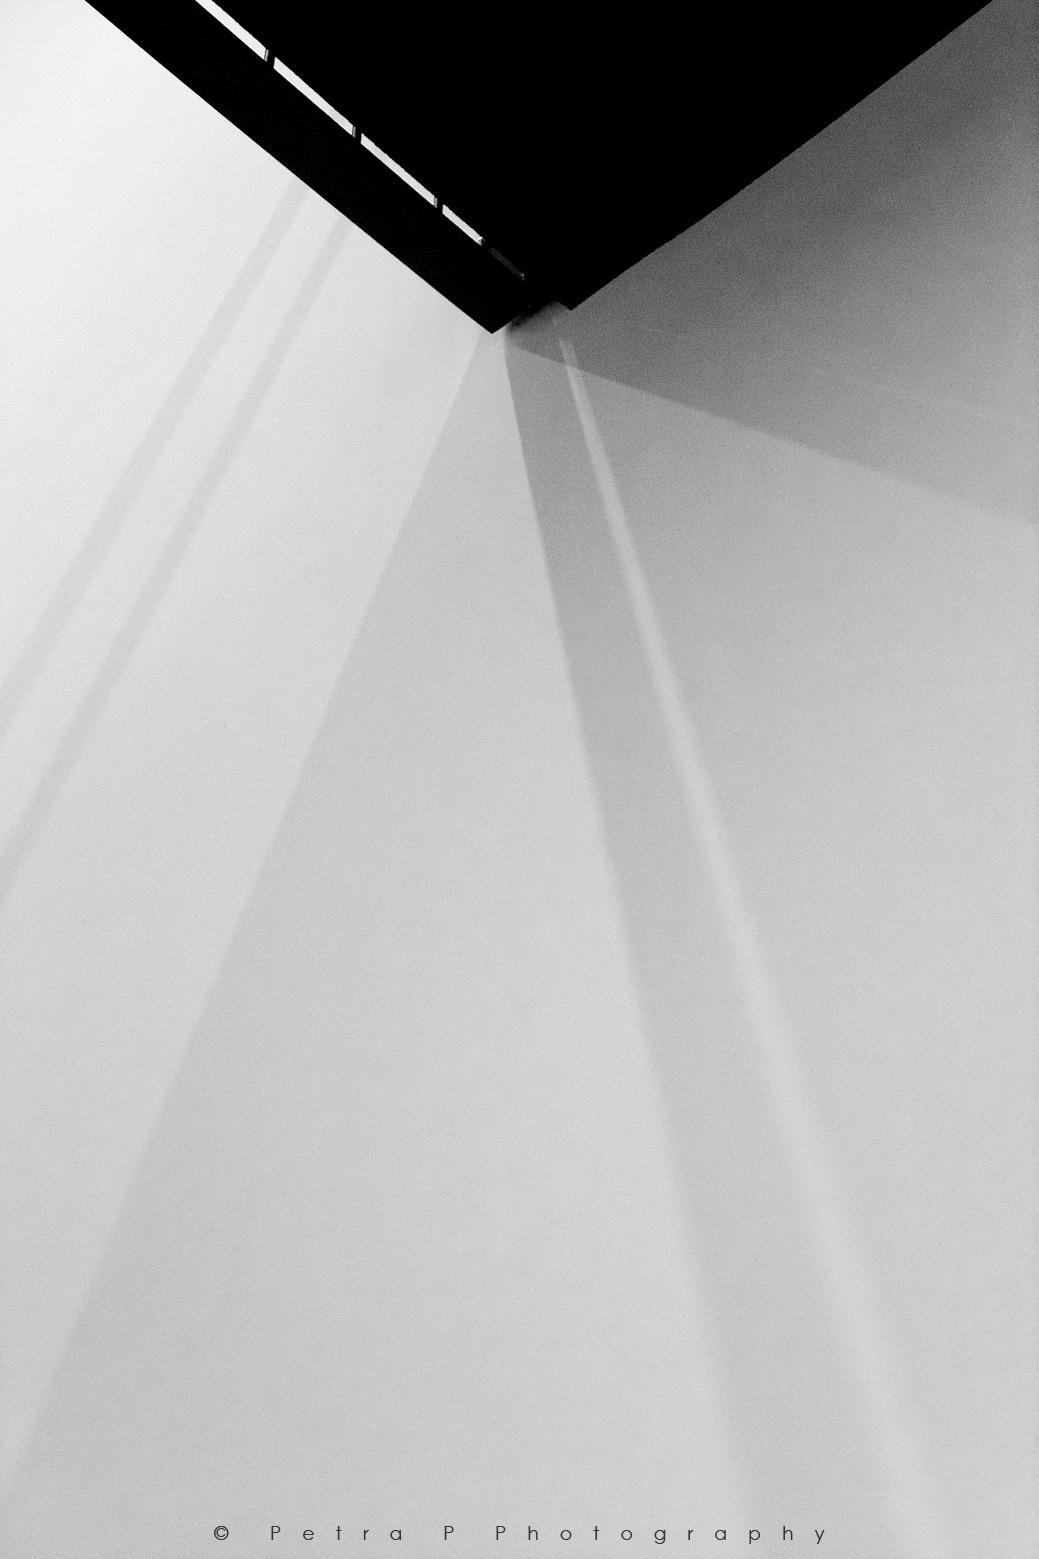 Shadows by Petra P